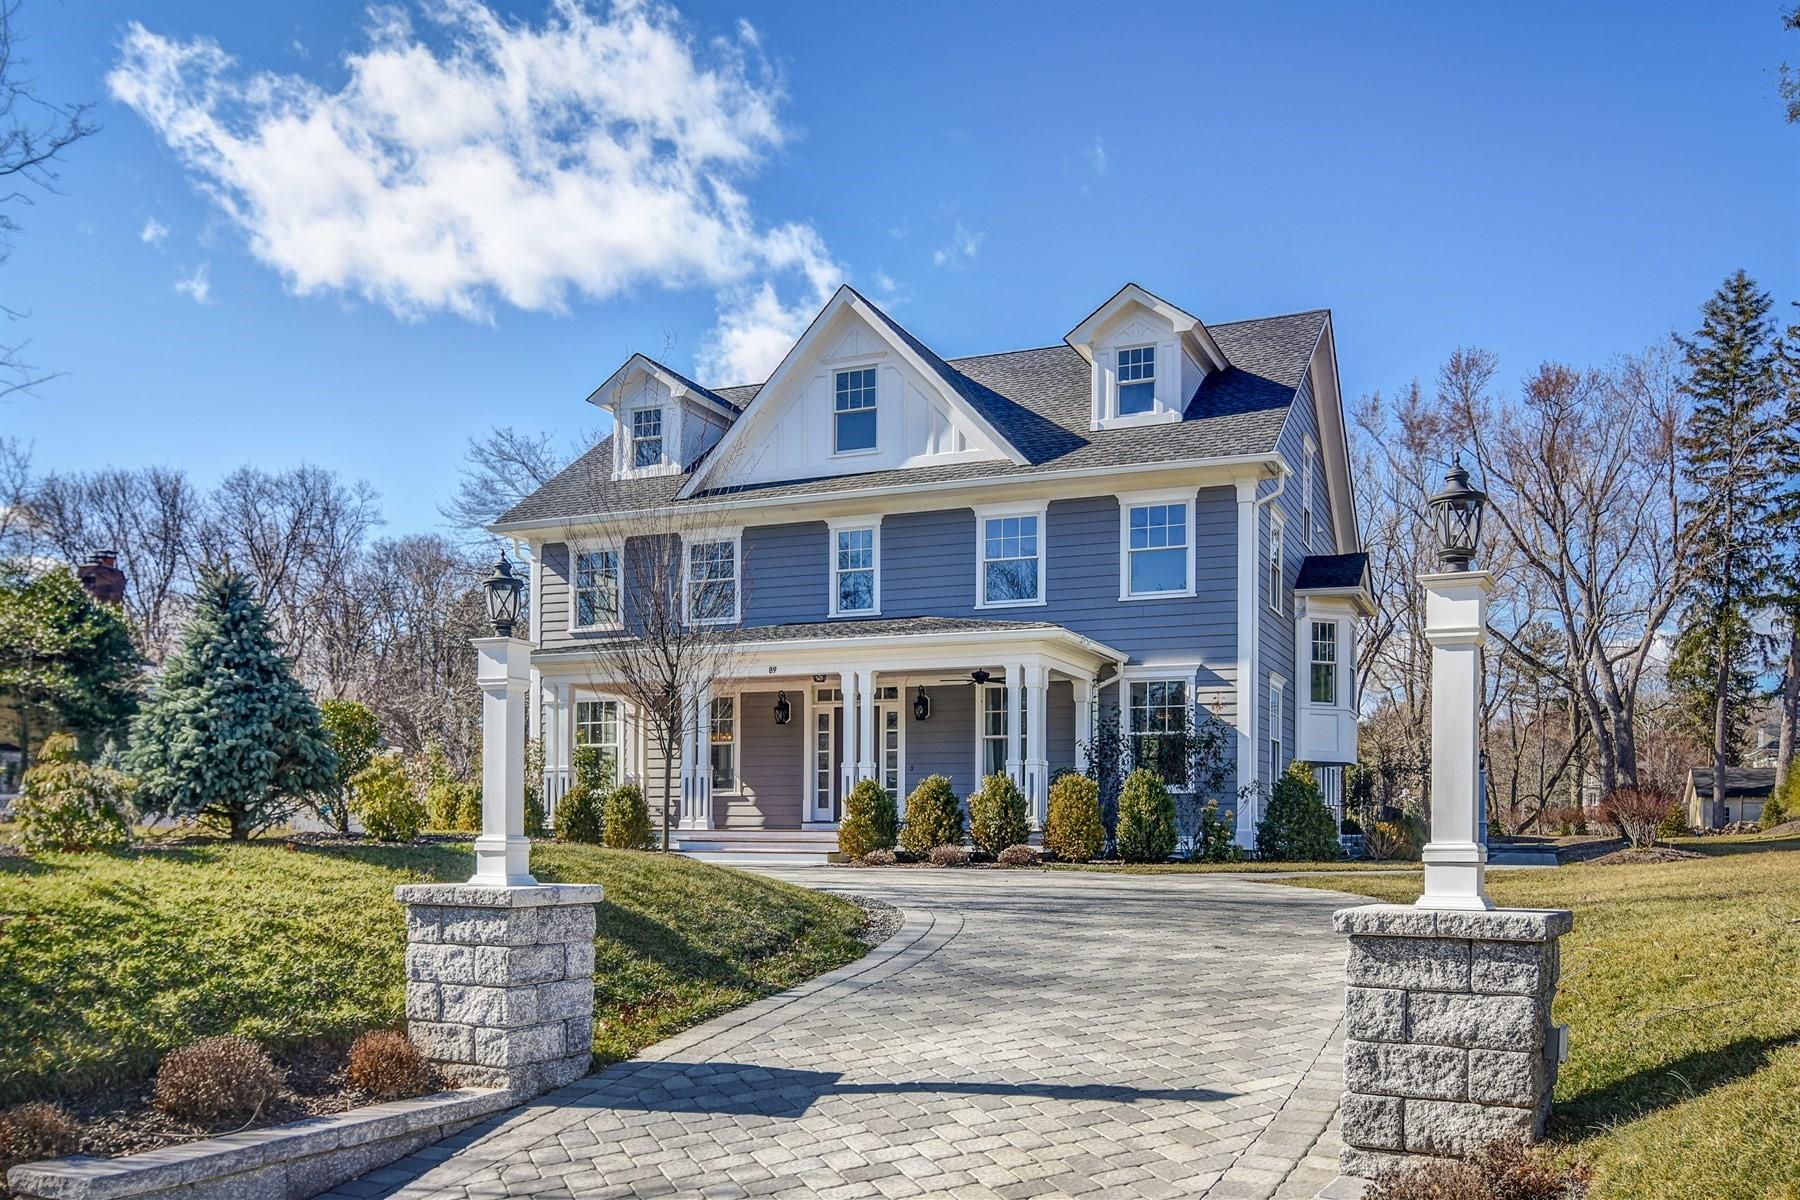 独户住宅 为 销售 在 Gracious Living on the Hill 89 Green Avenue Madison, 07940 美国